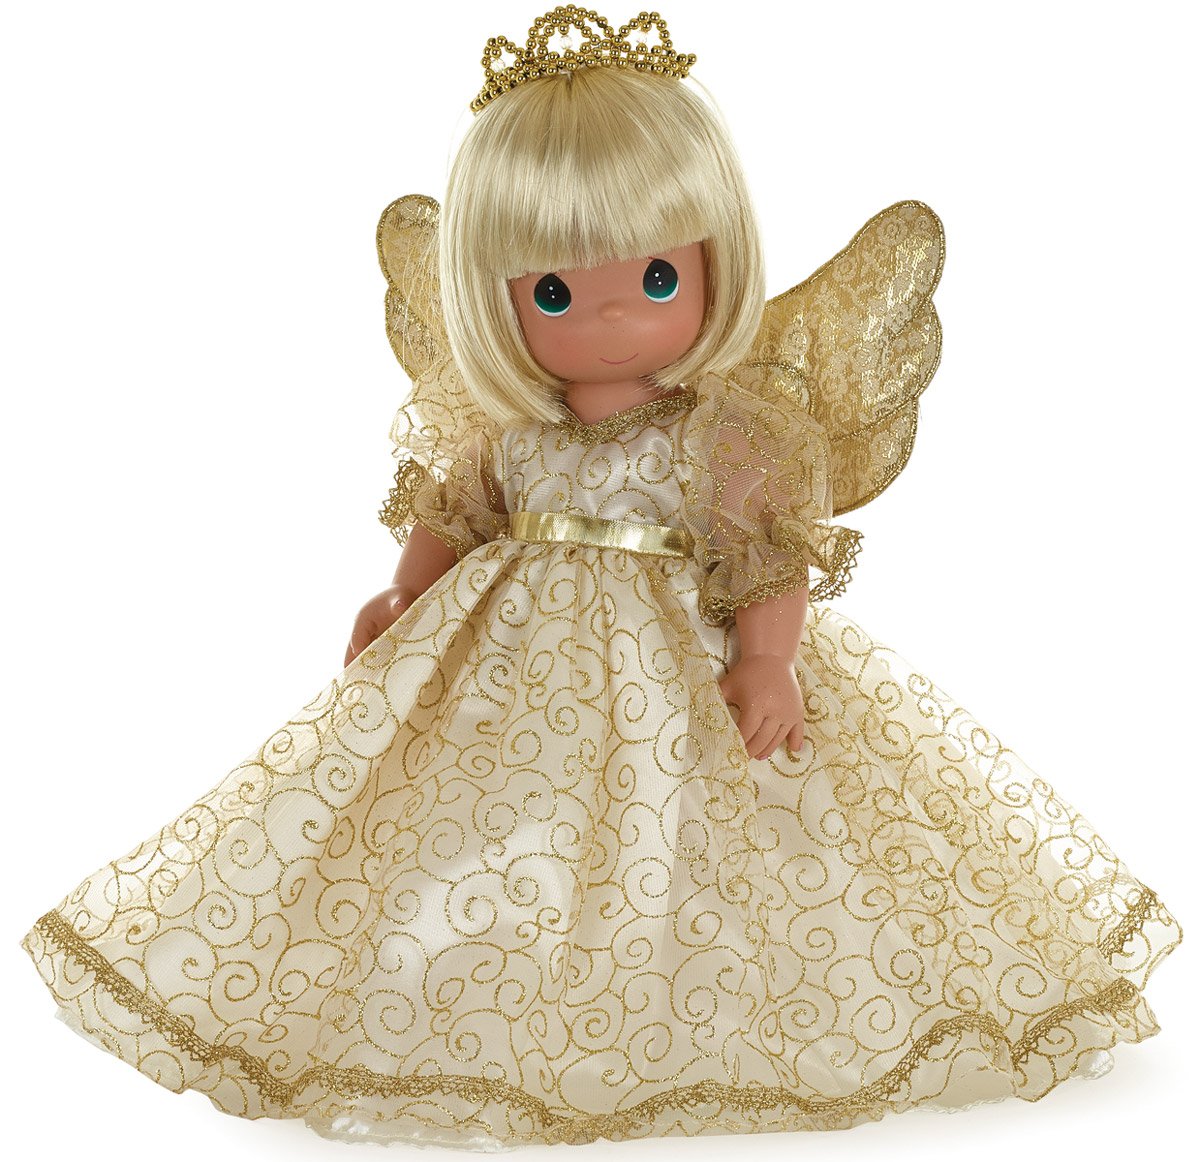 Precious Moments Кукла Ангельский шепот блондинка precious moments кукла покахонтас